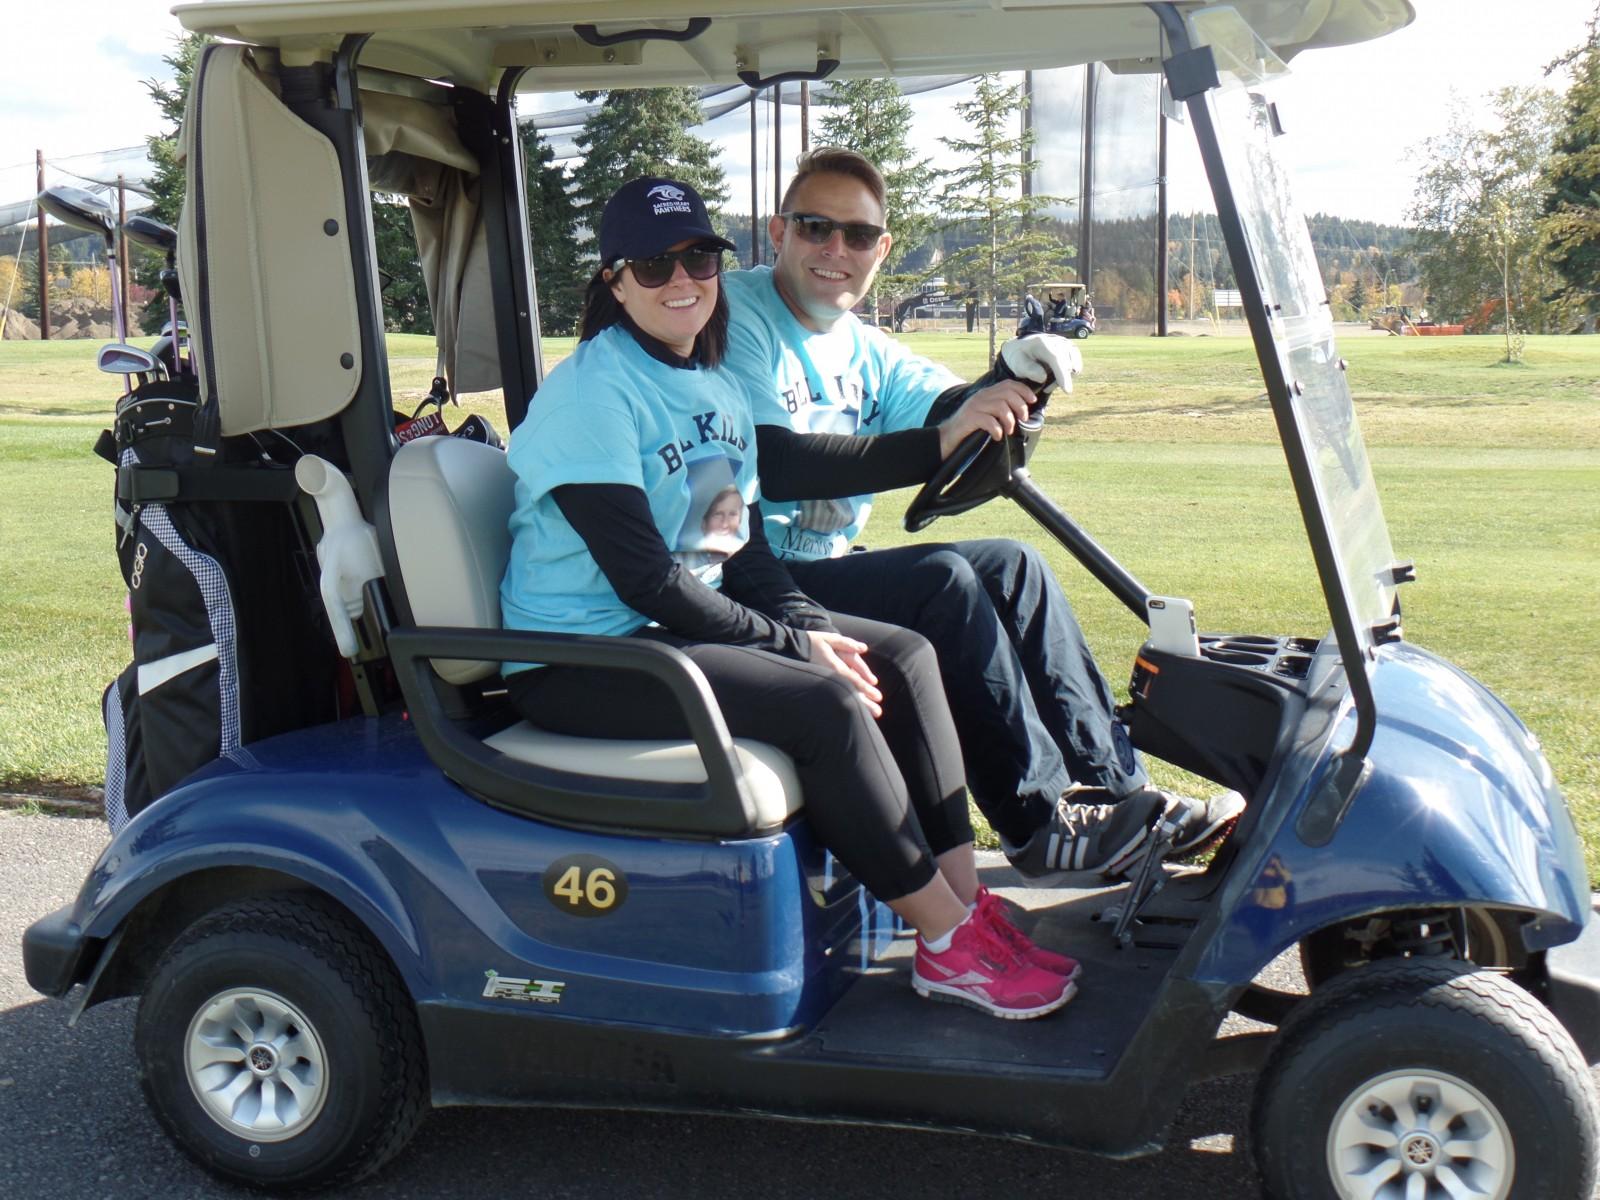 FunChaser @ Bill Kilbey Memorial Golf Tournament